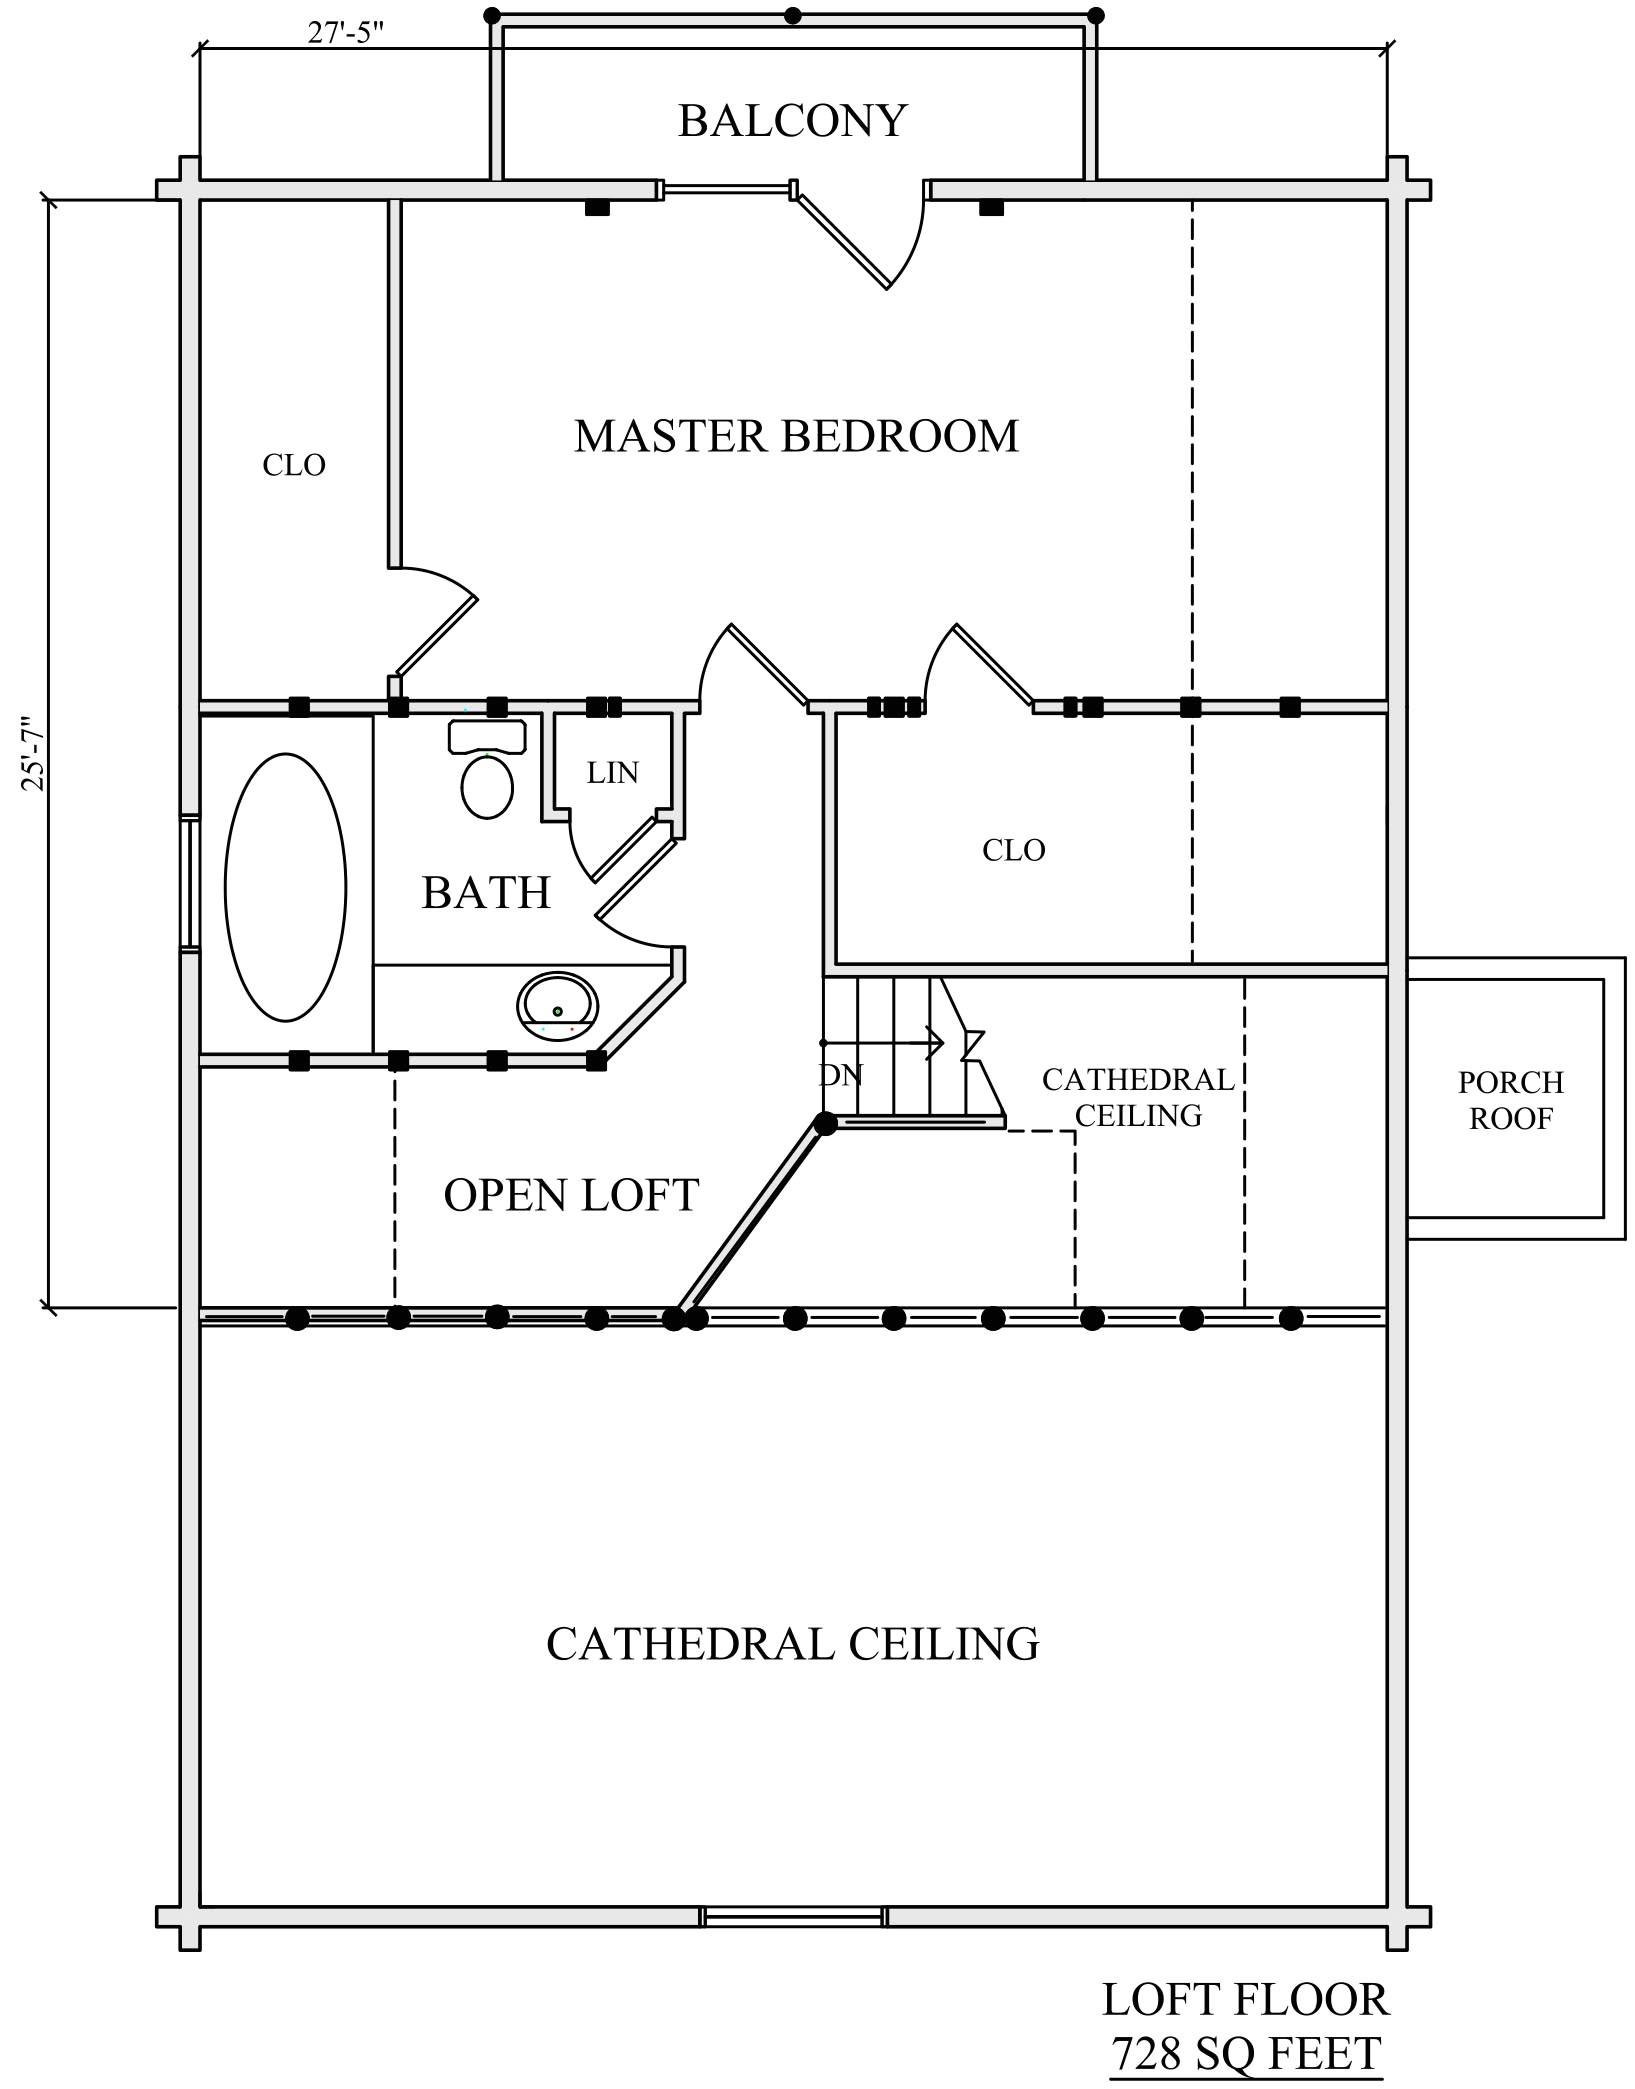 2500 Sq Ft Log Home Plans Log Home Plan 01866 Katahdin Cedar Log Homes Floor Plans